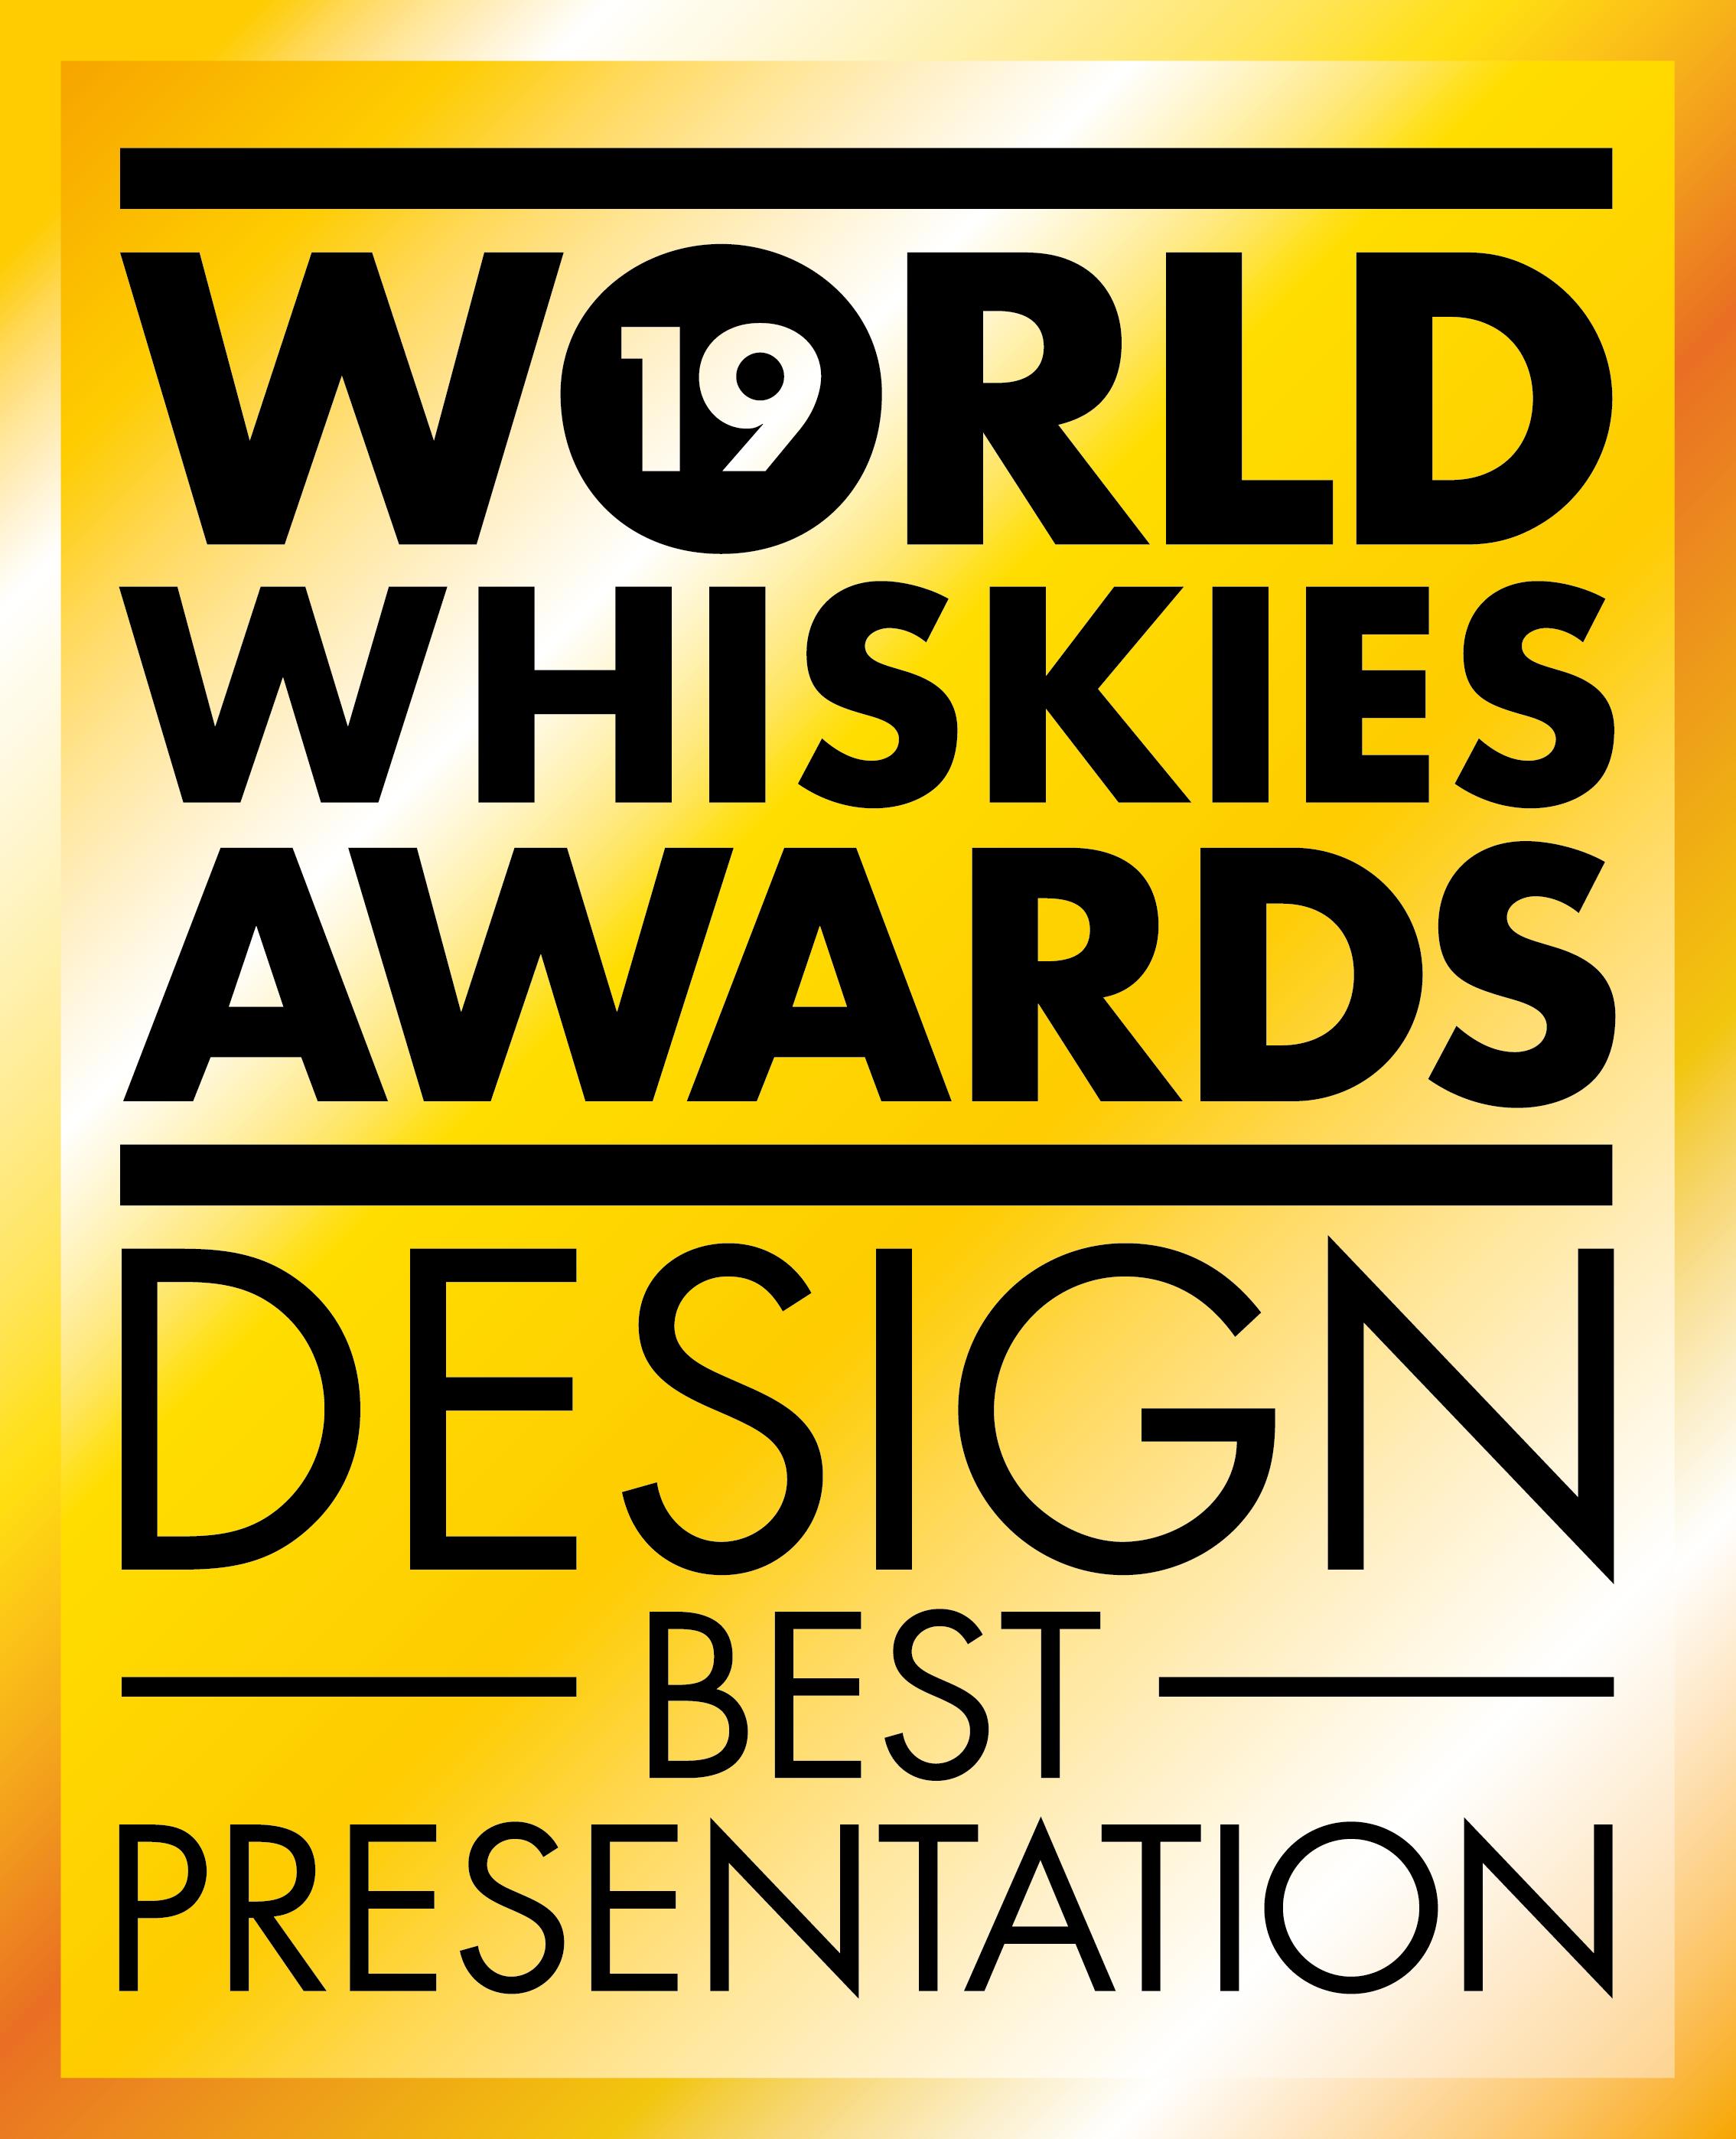 WWA19-Design-Presentation2.png